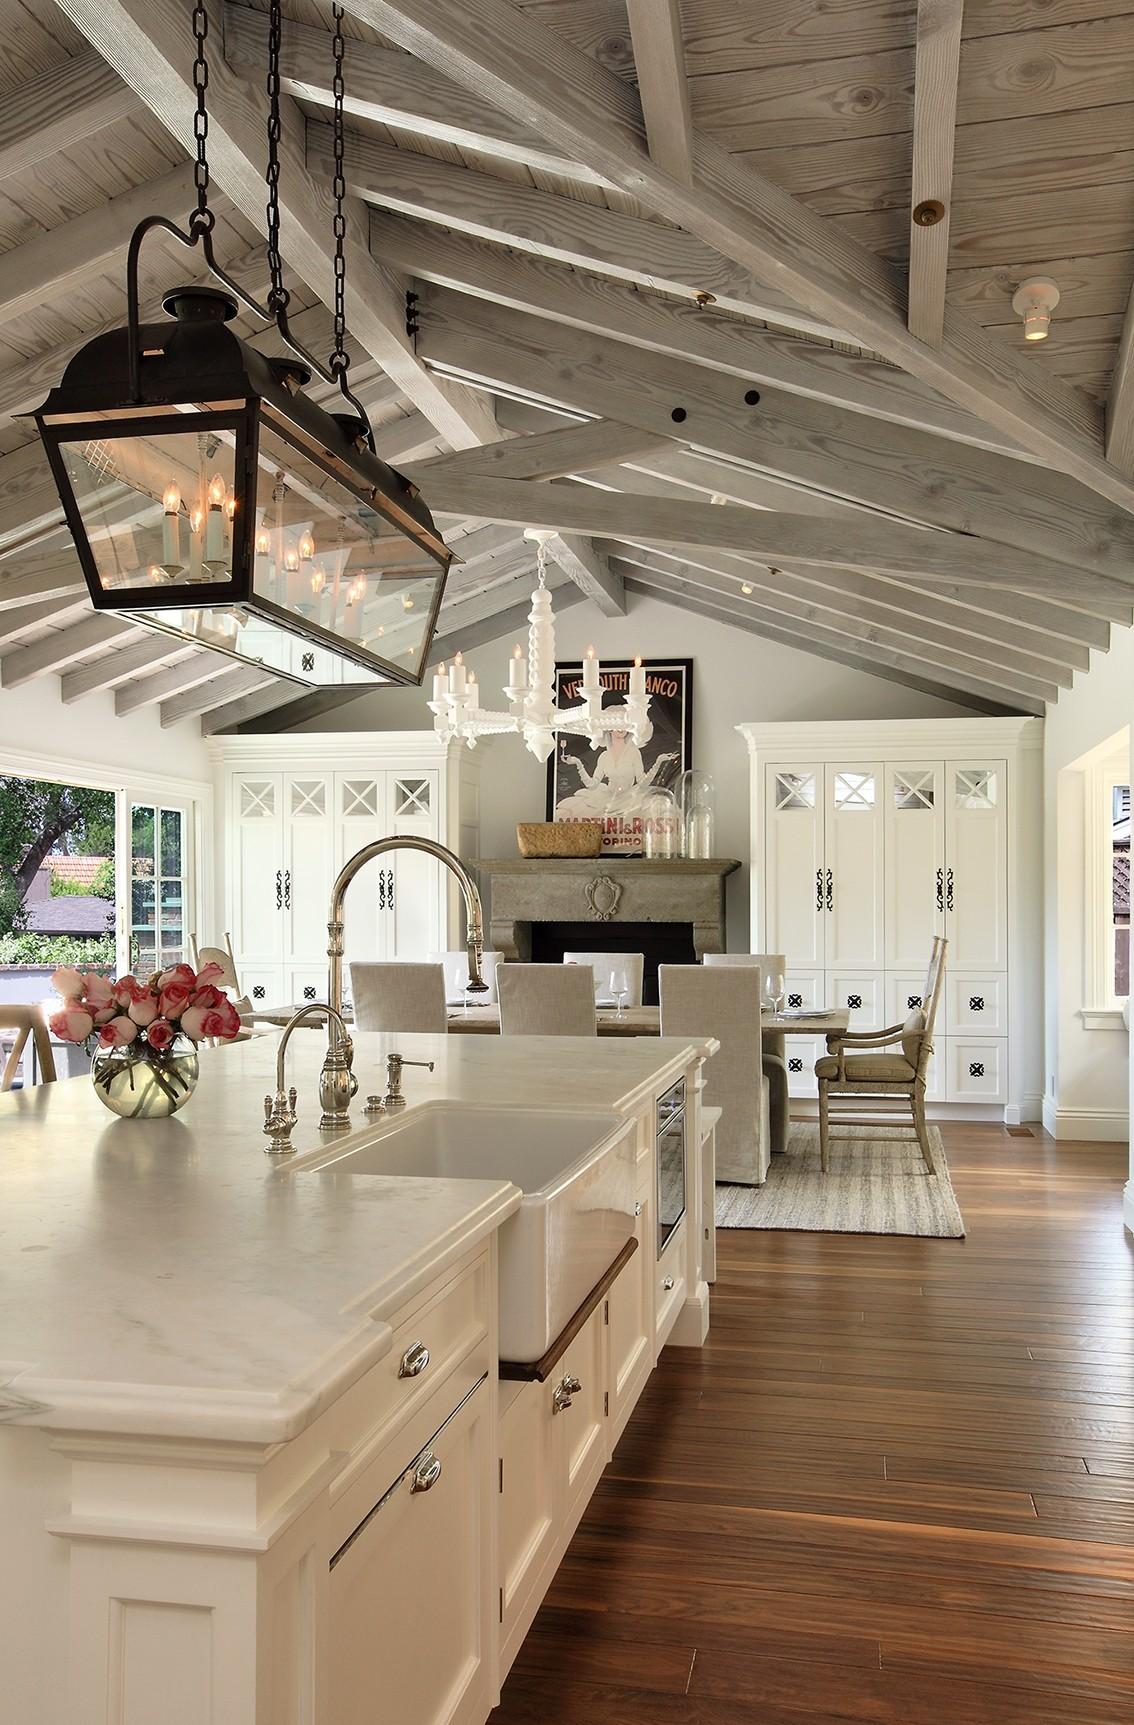 golf_house_kitchen_greatroom_beams.jpg